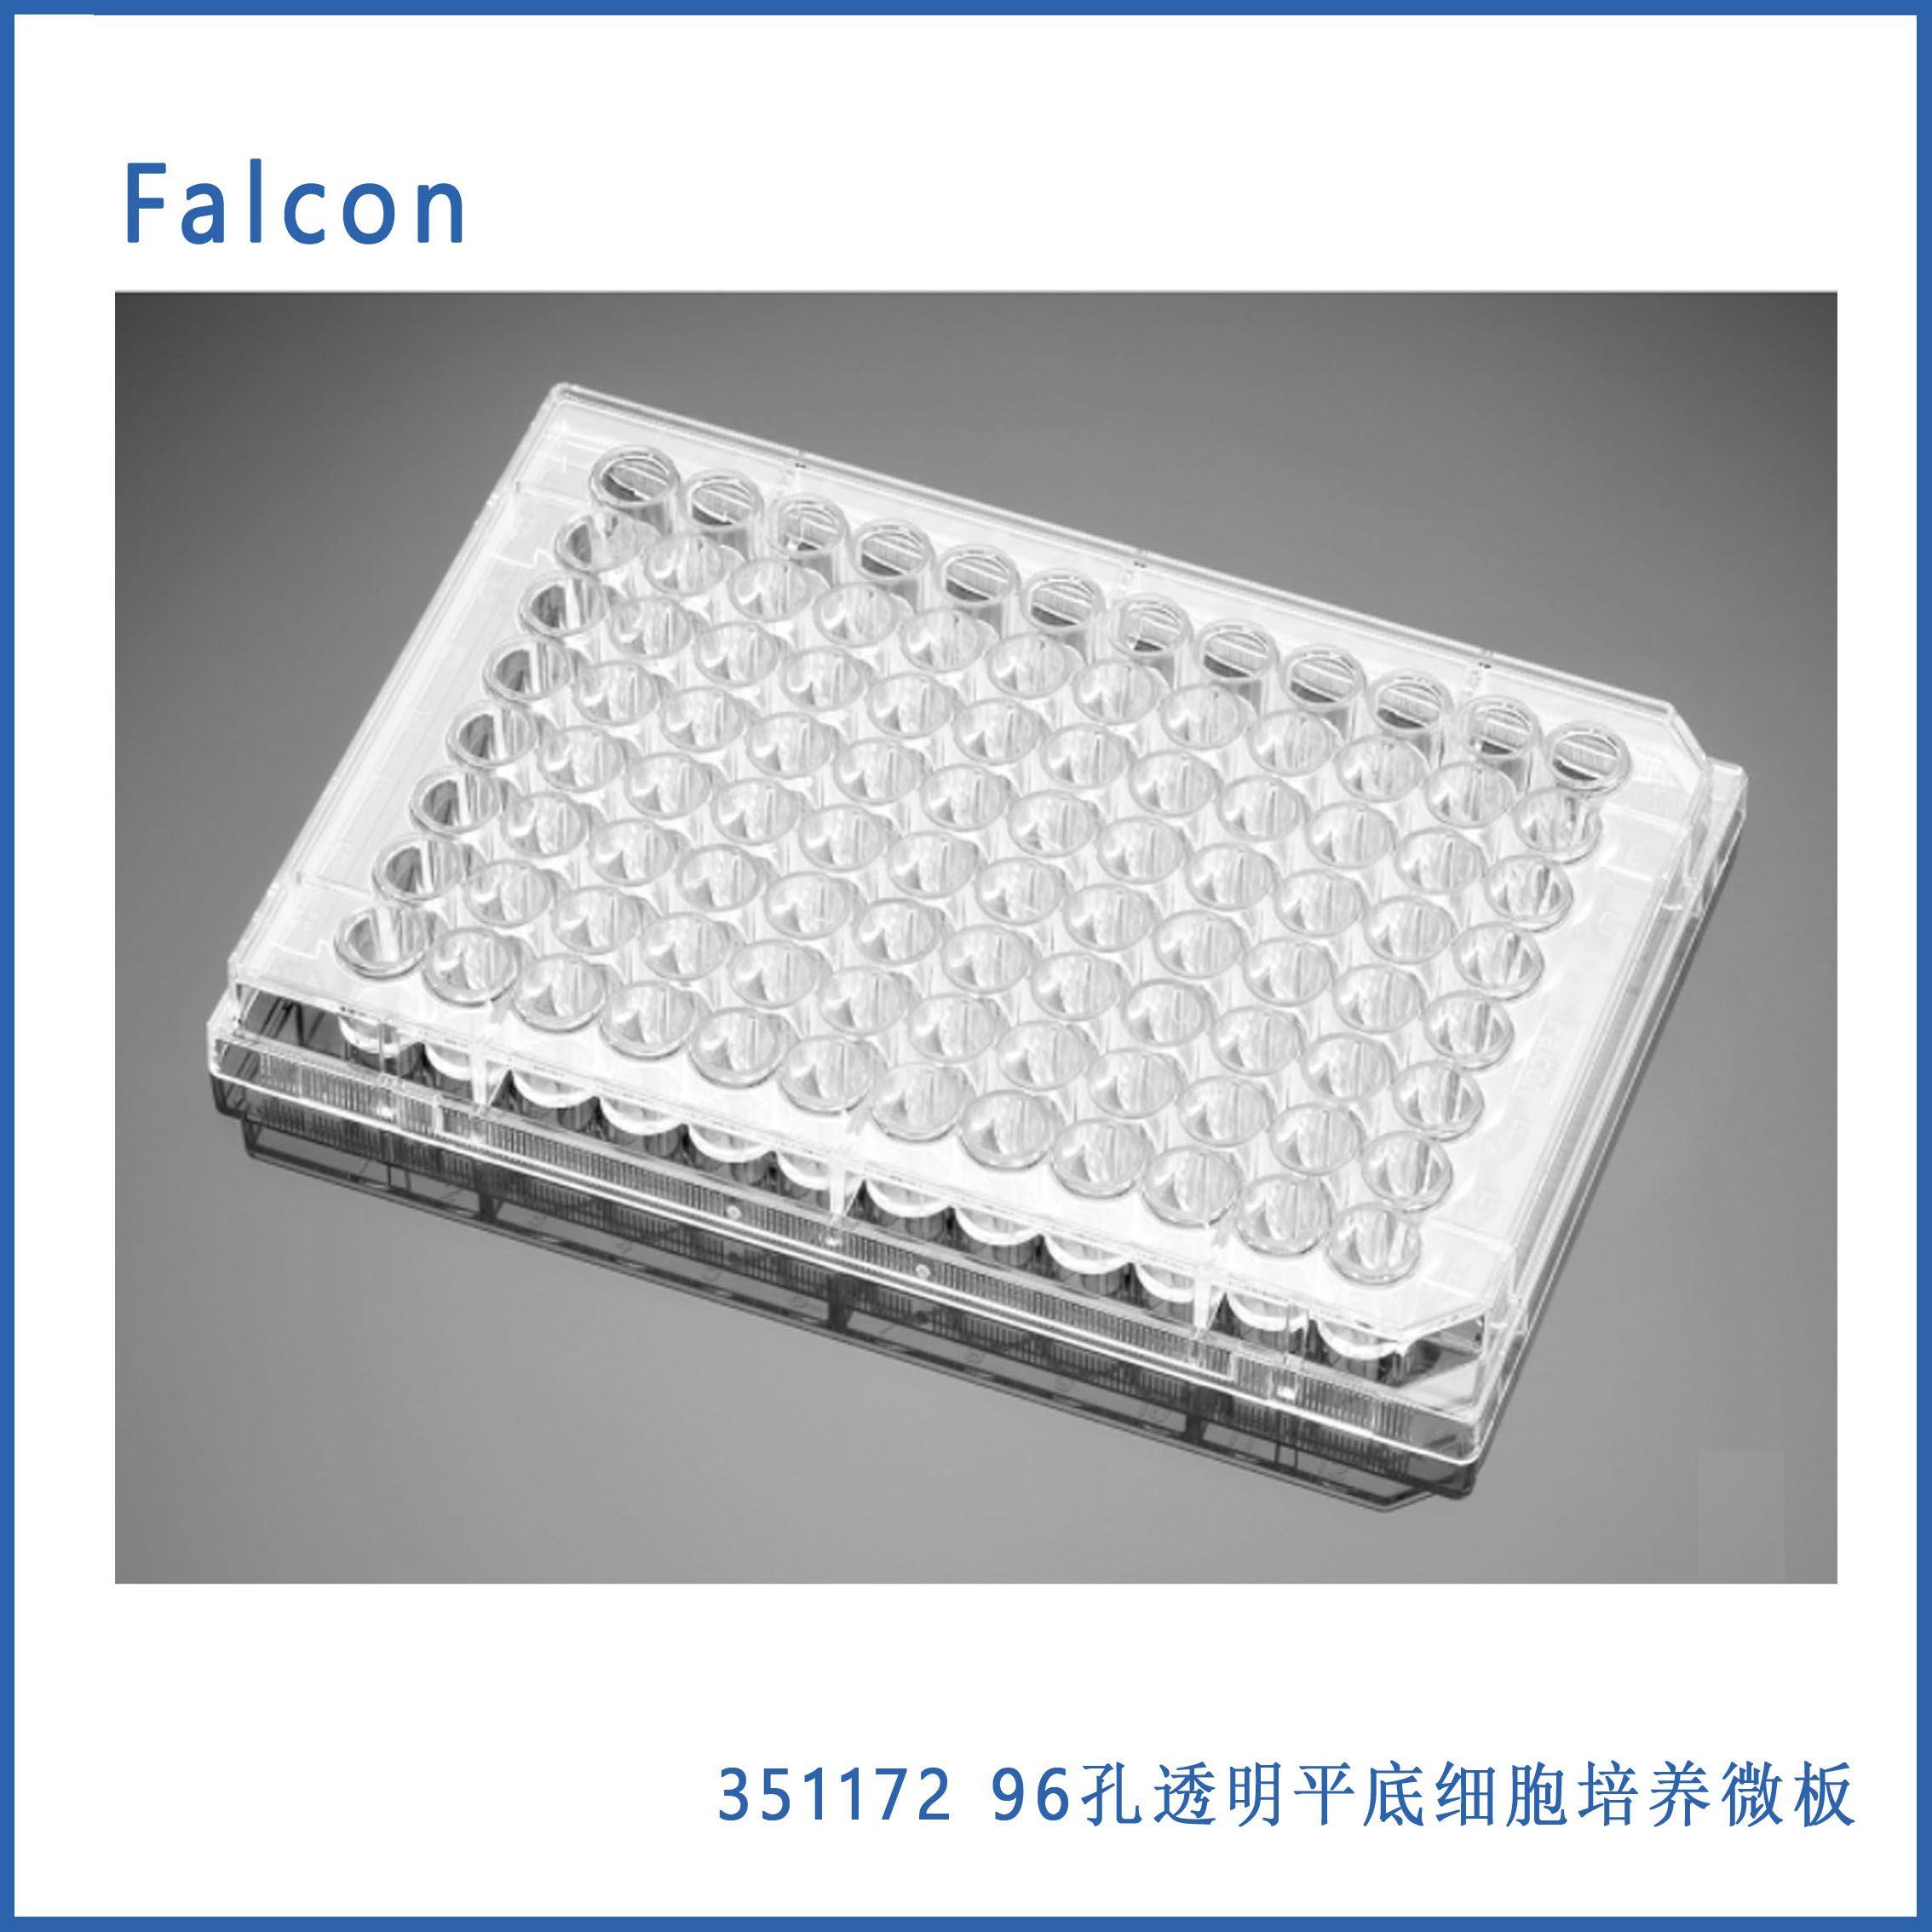 Corning Falcon 351172 96孔透明平底未处理细胞培养微板,  带盖,单独包装,无菌,50/箱,现货